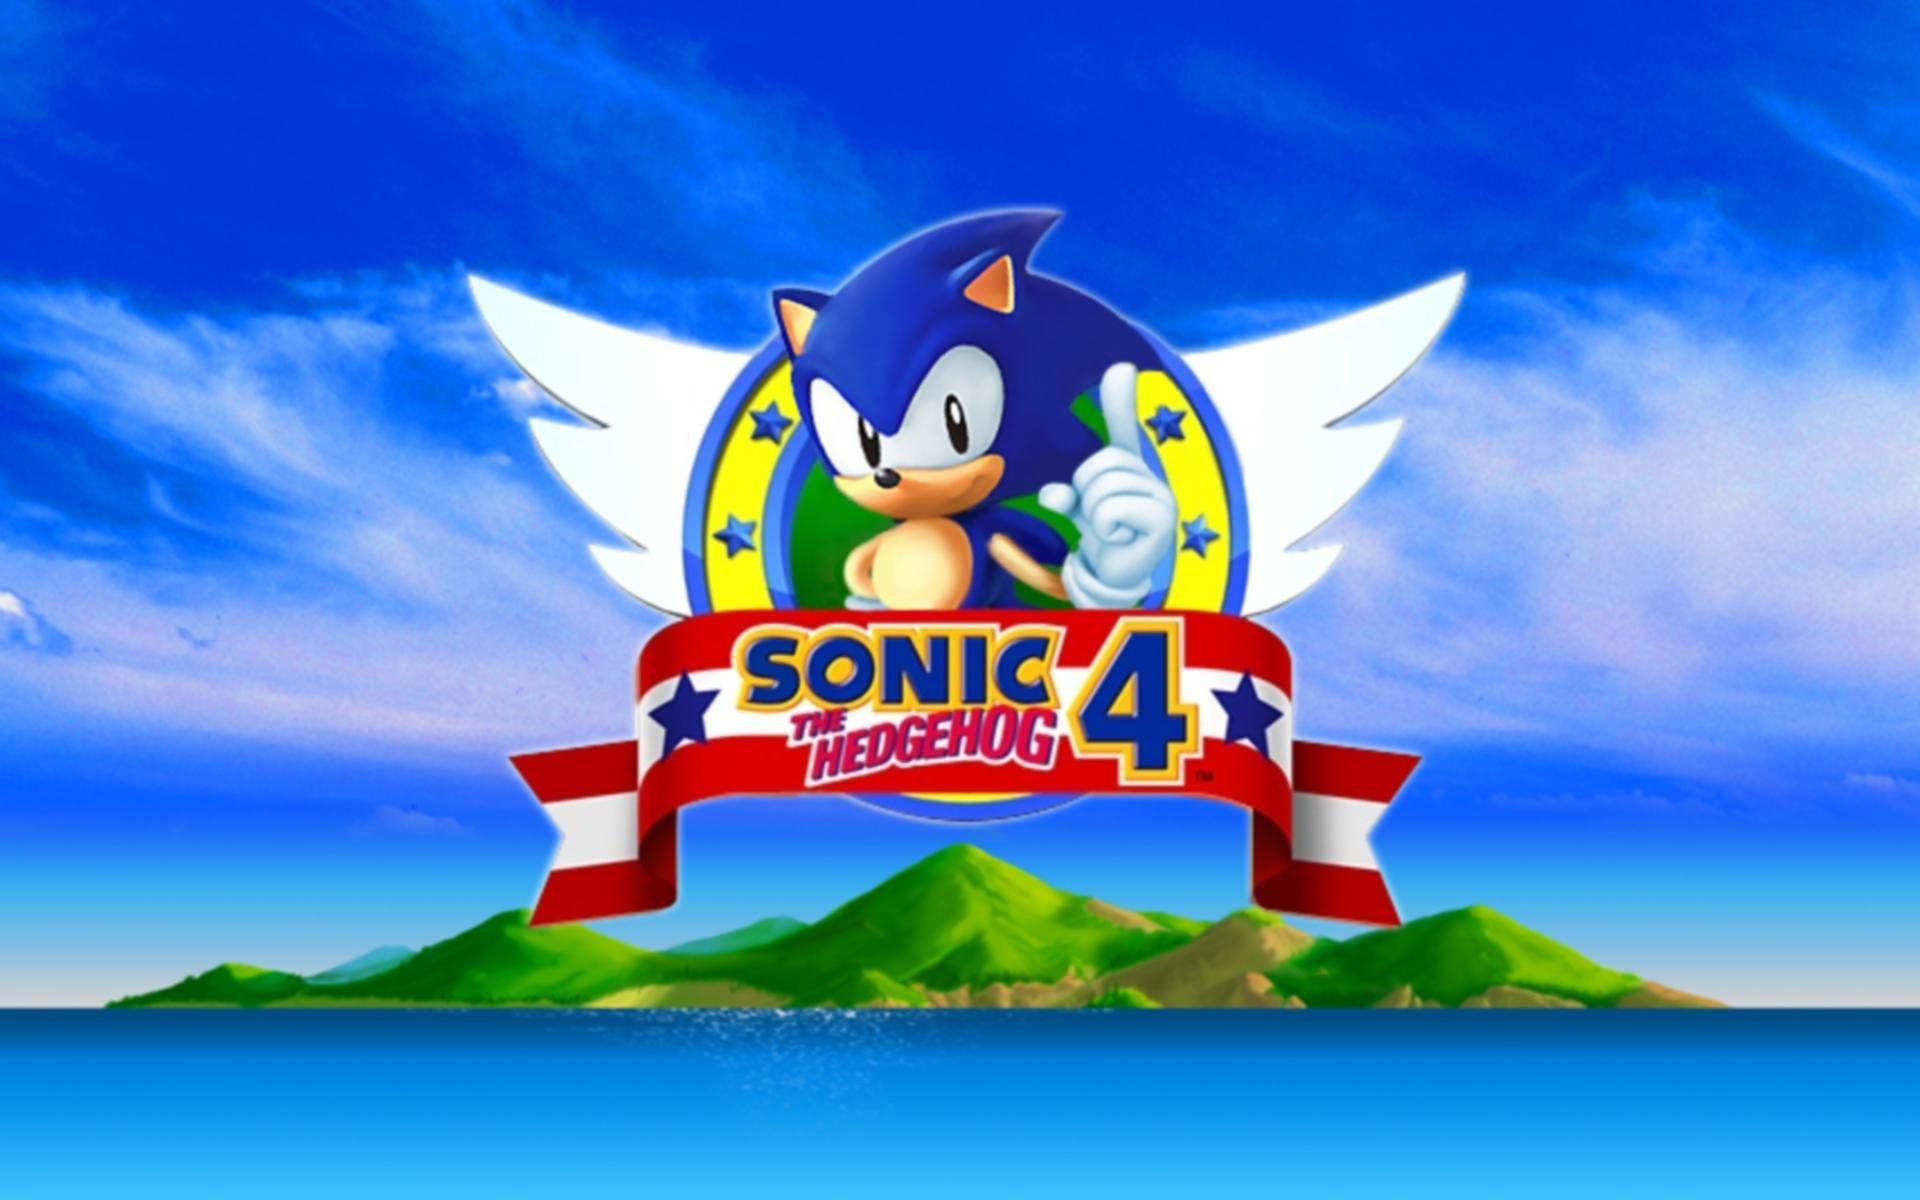 Sonic The Hedgehog HD Desktop Wallpapers for Widescreen, High .